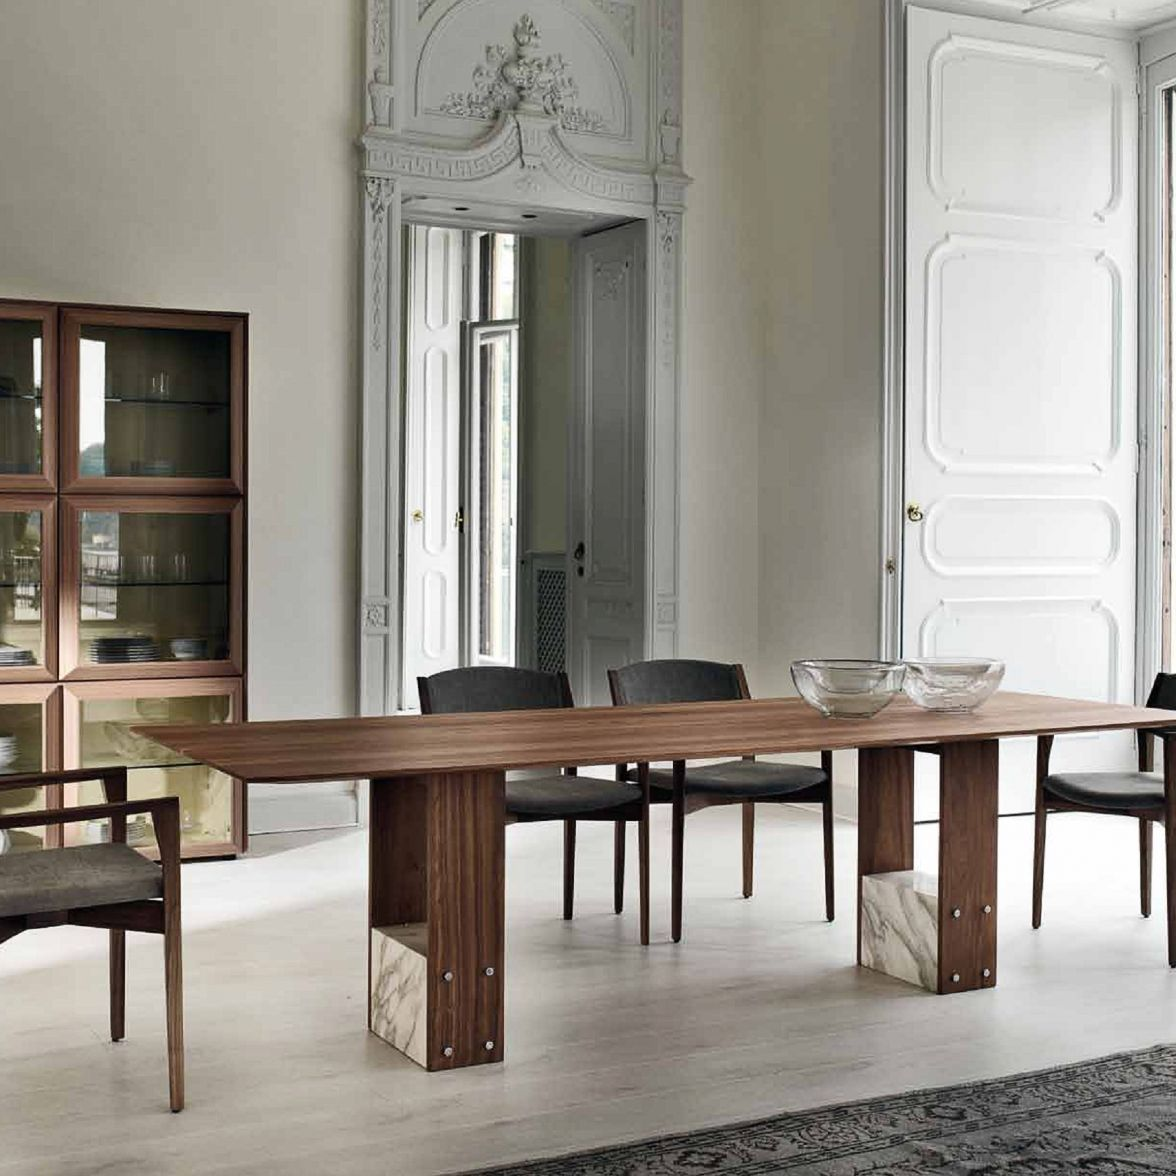 Shani table